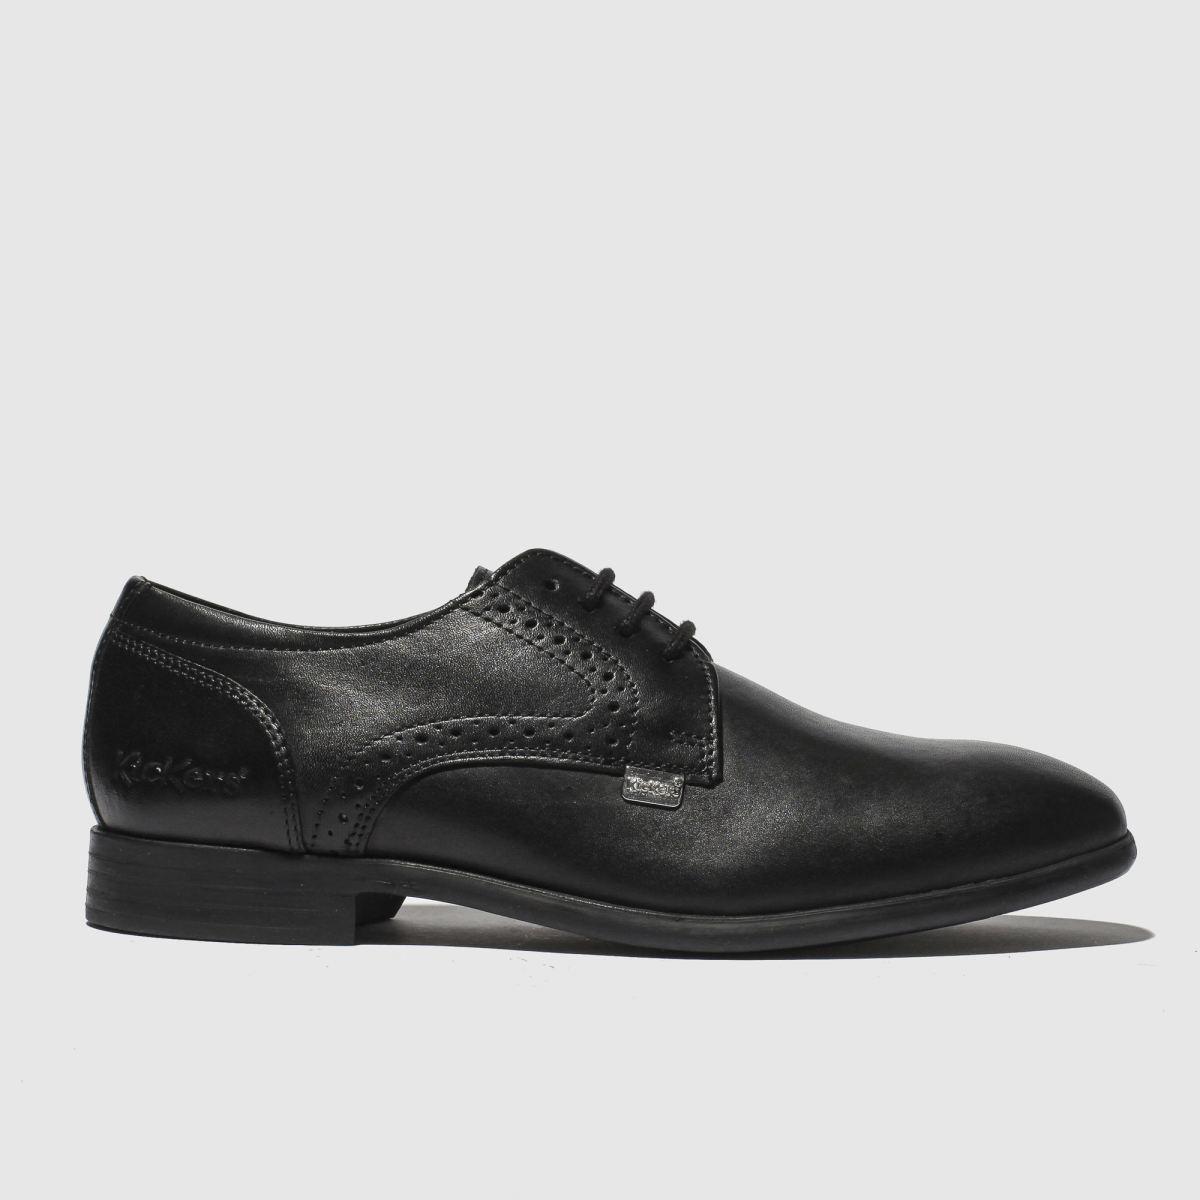 Kickers Black Jarle Lace Up Shoes Junior